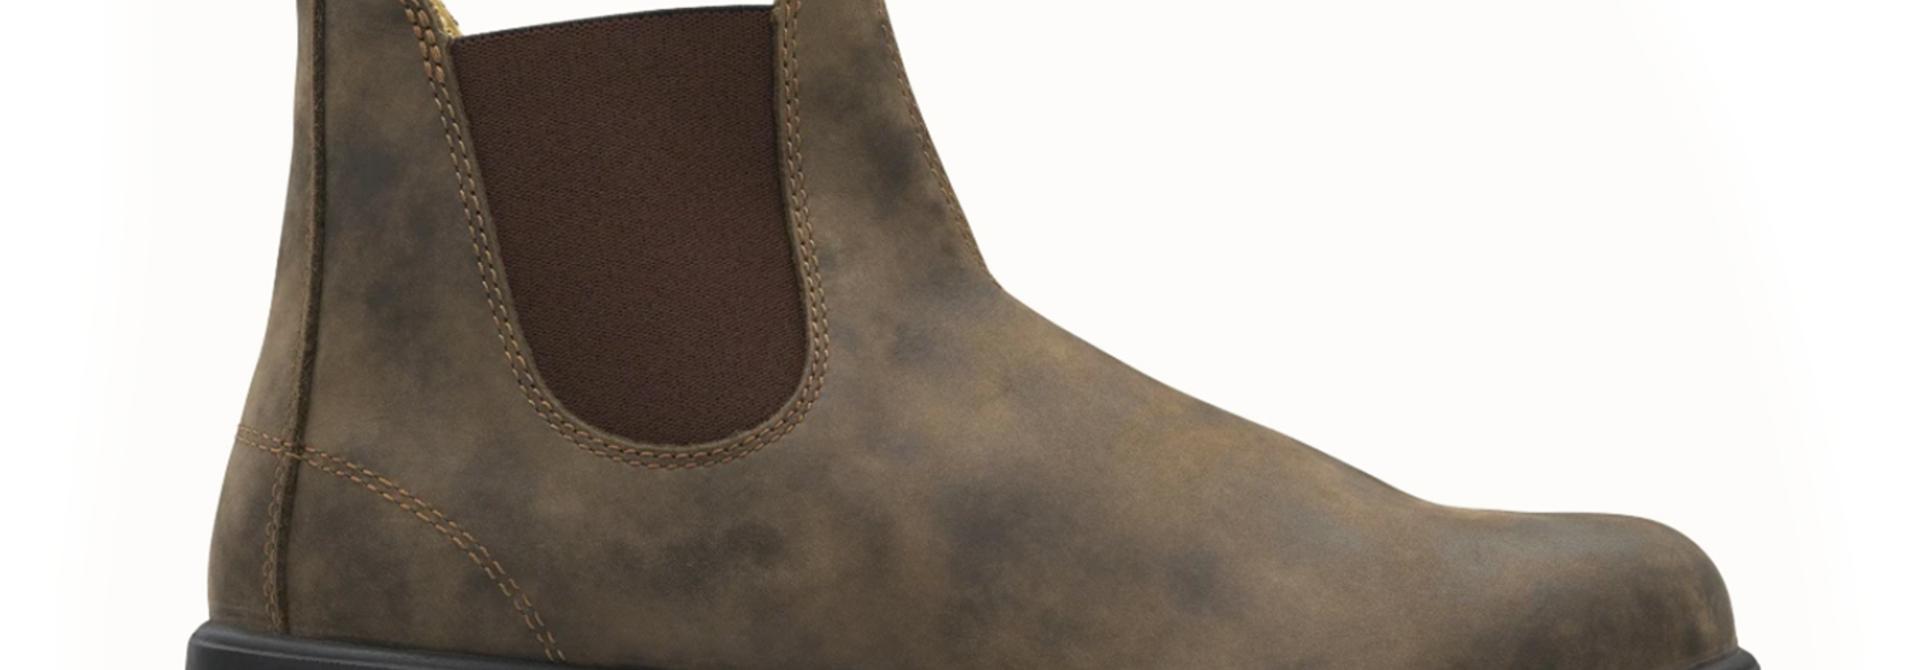 Chelsea Boot, Rustic Brown